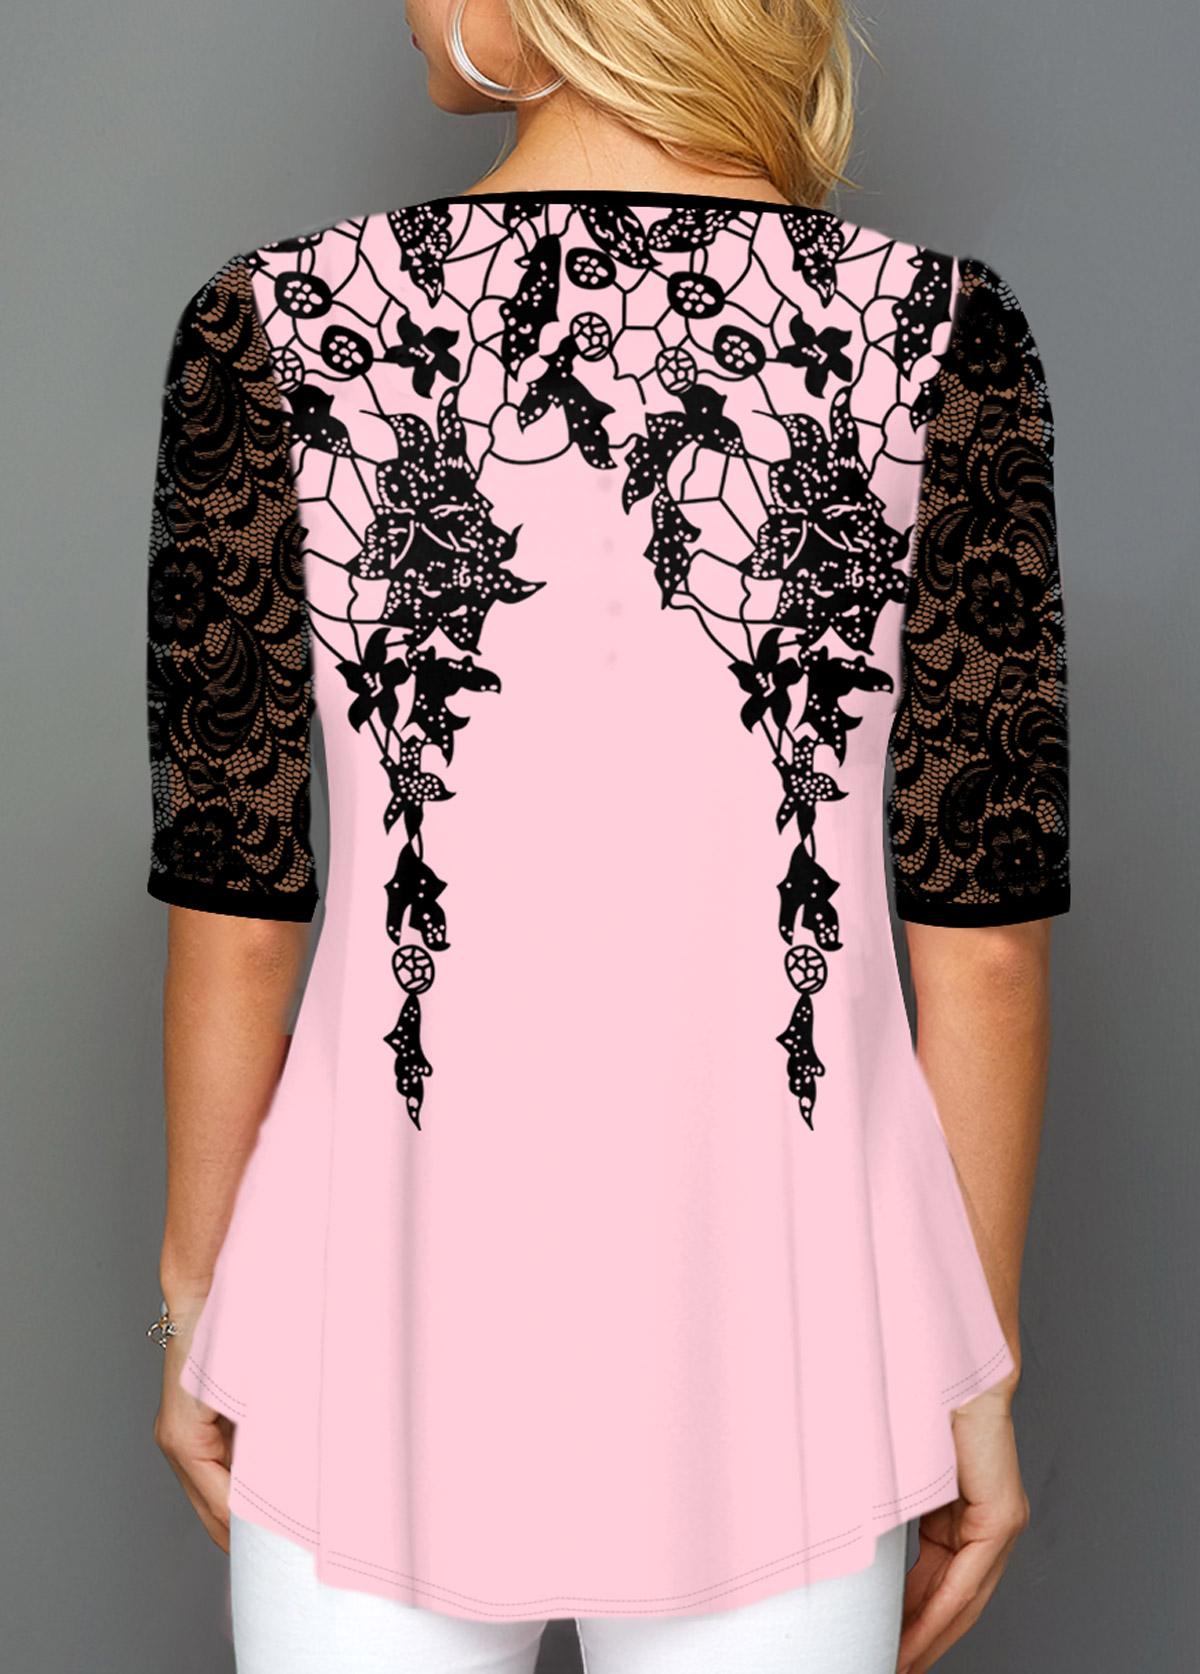 Floral Print Round Neck Lace Panel T Shirt